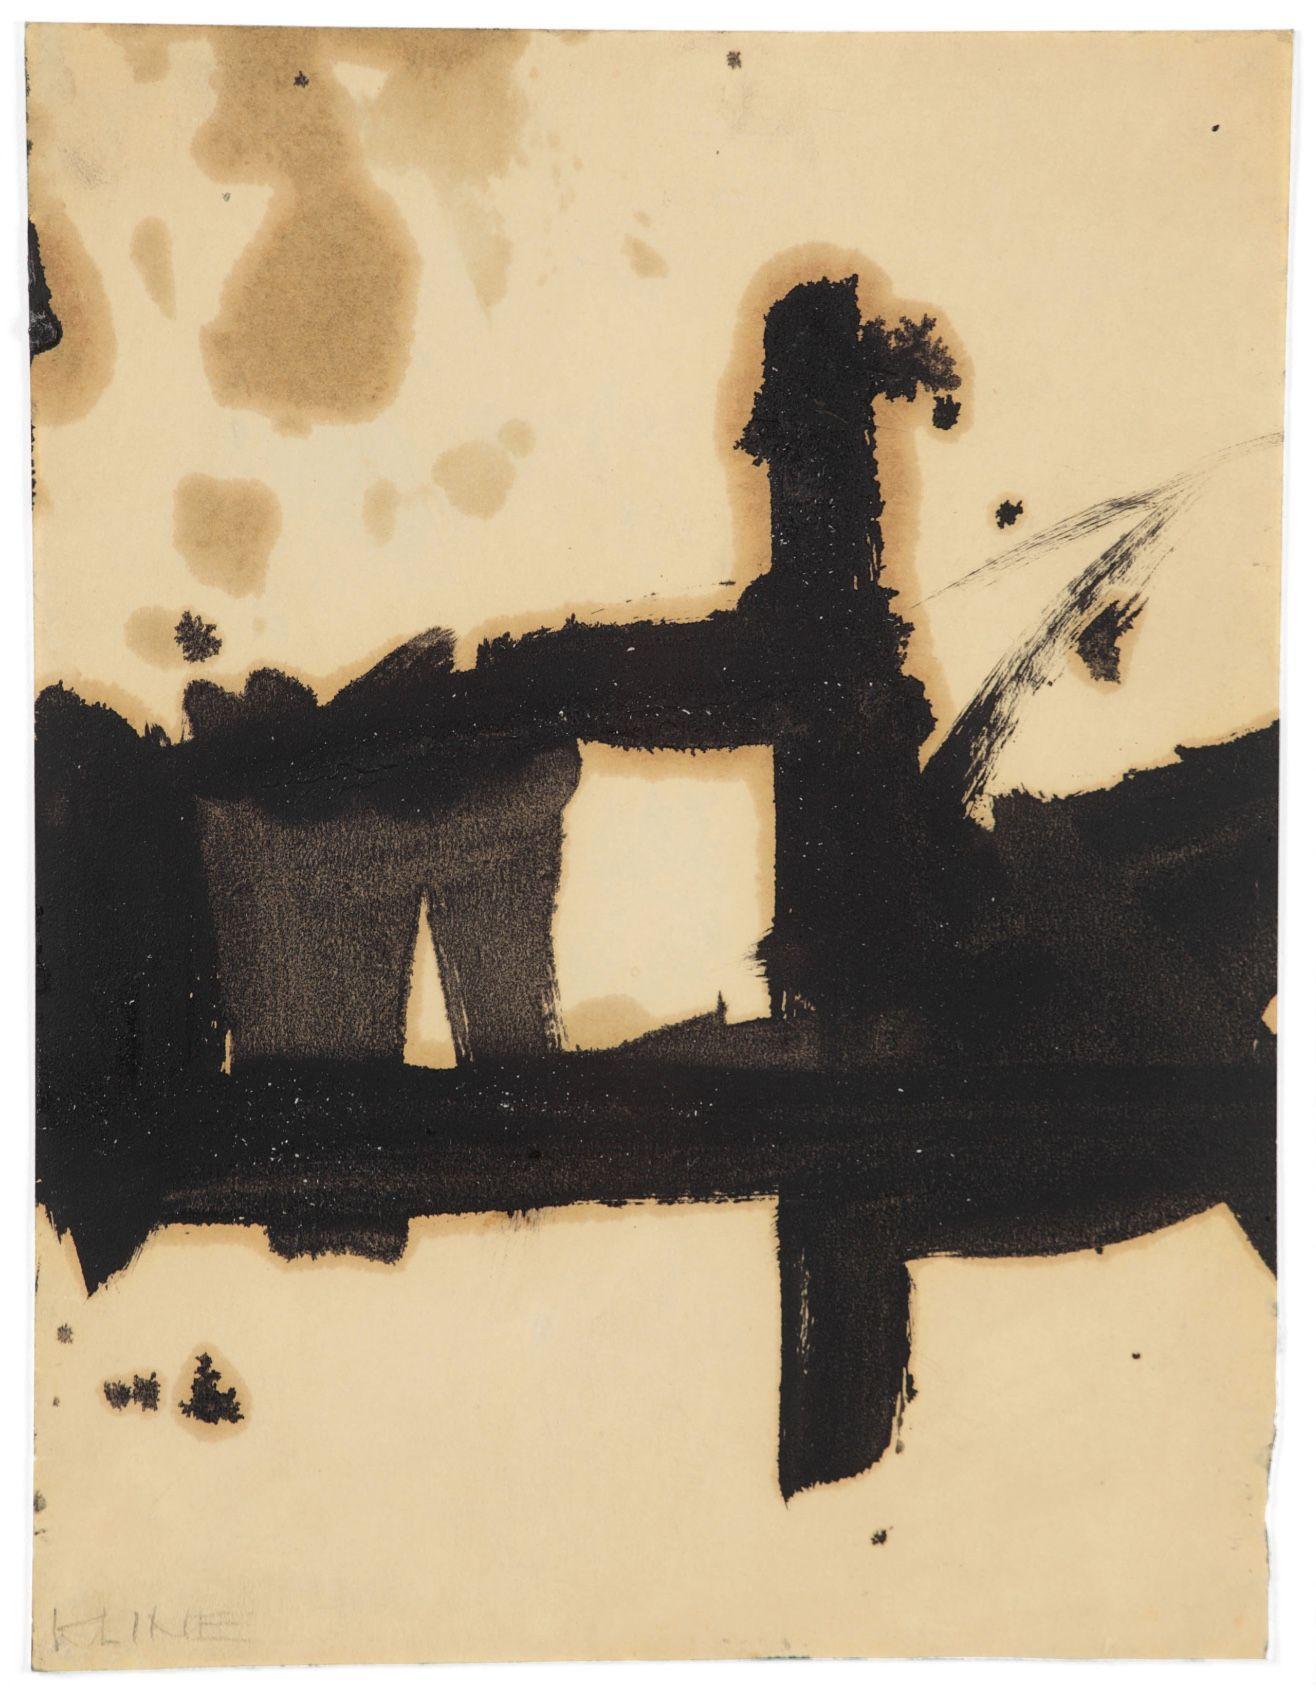 Franz Kline (1910-1962) Composition, n.d.